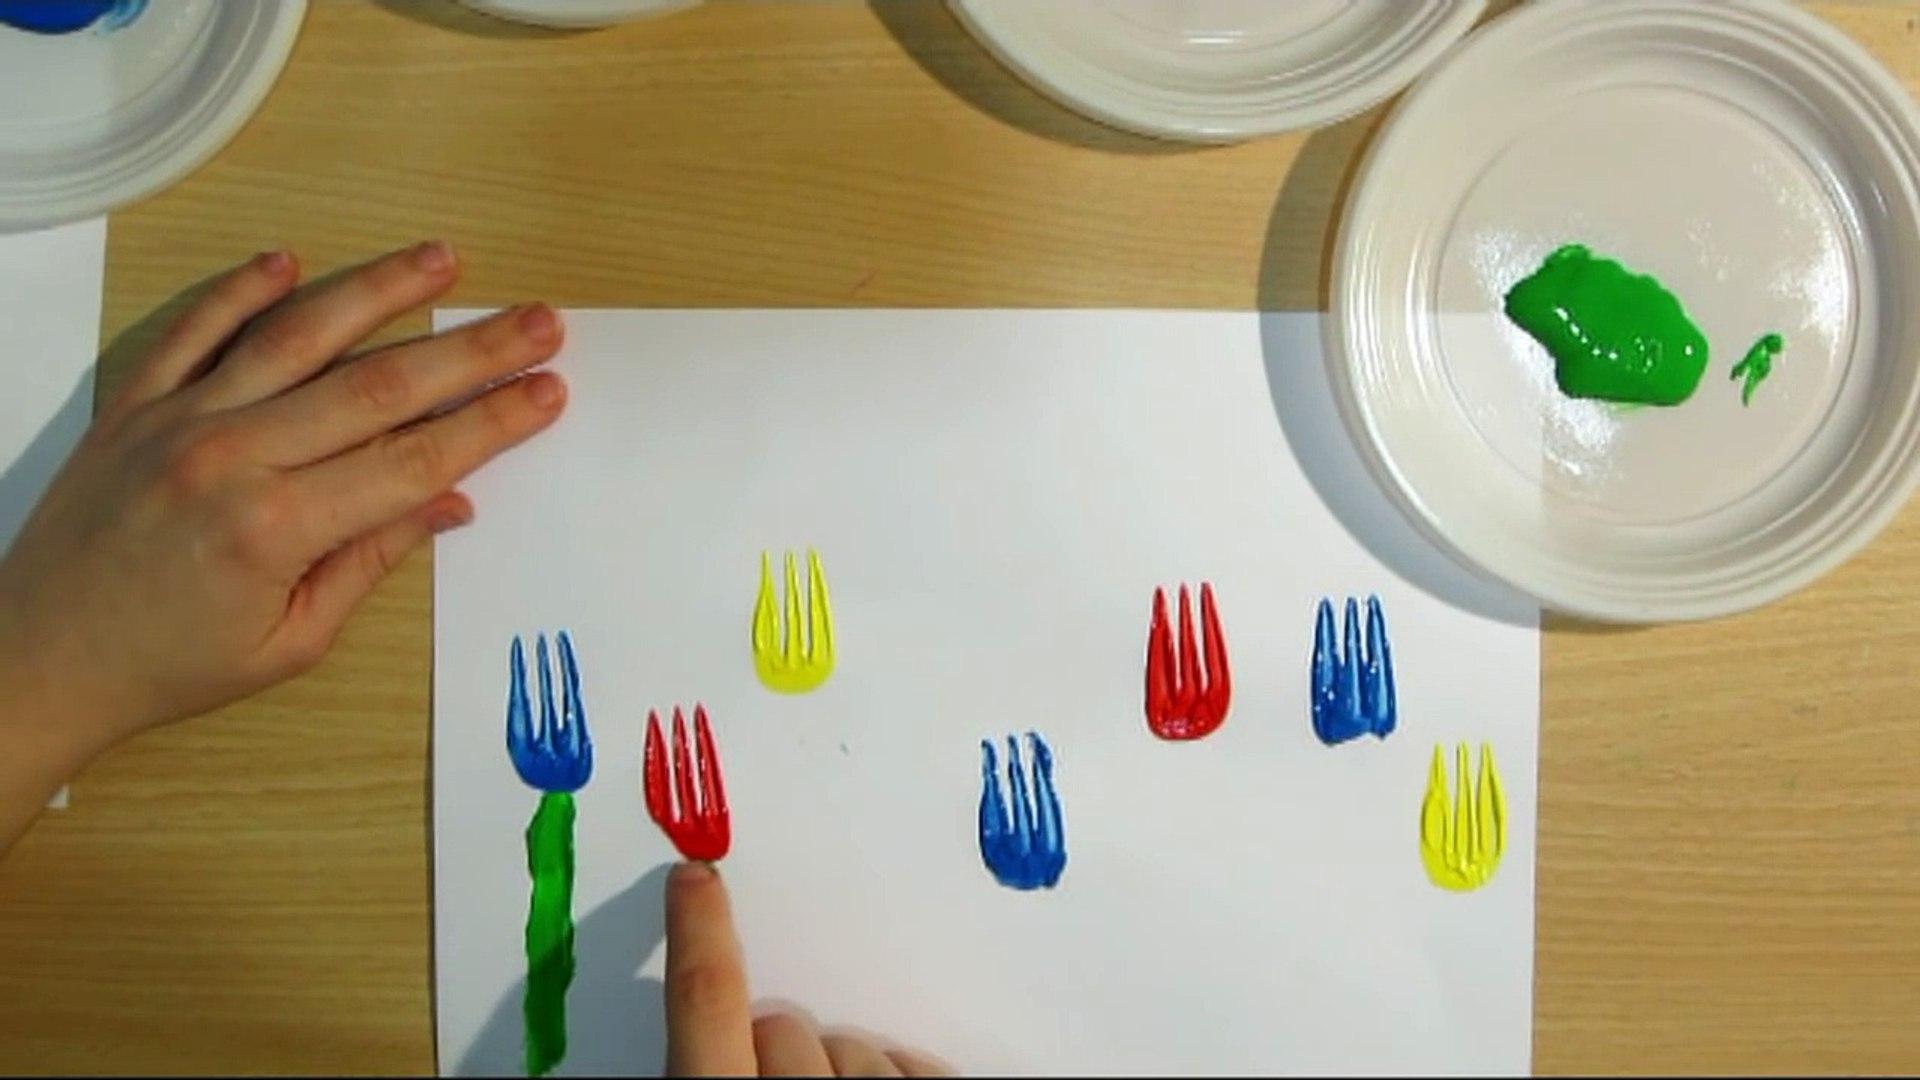 FLOWERS: ORIGINAL PRESCHOOL ACTIVITIES - KIDS SIMPLE DRAWING for children, kids, babies Le